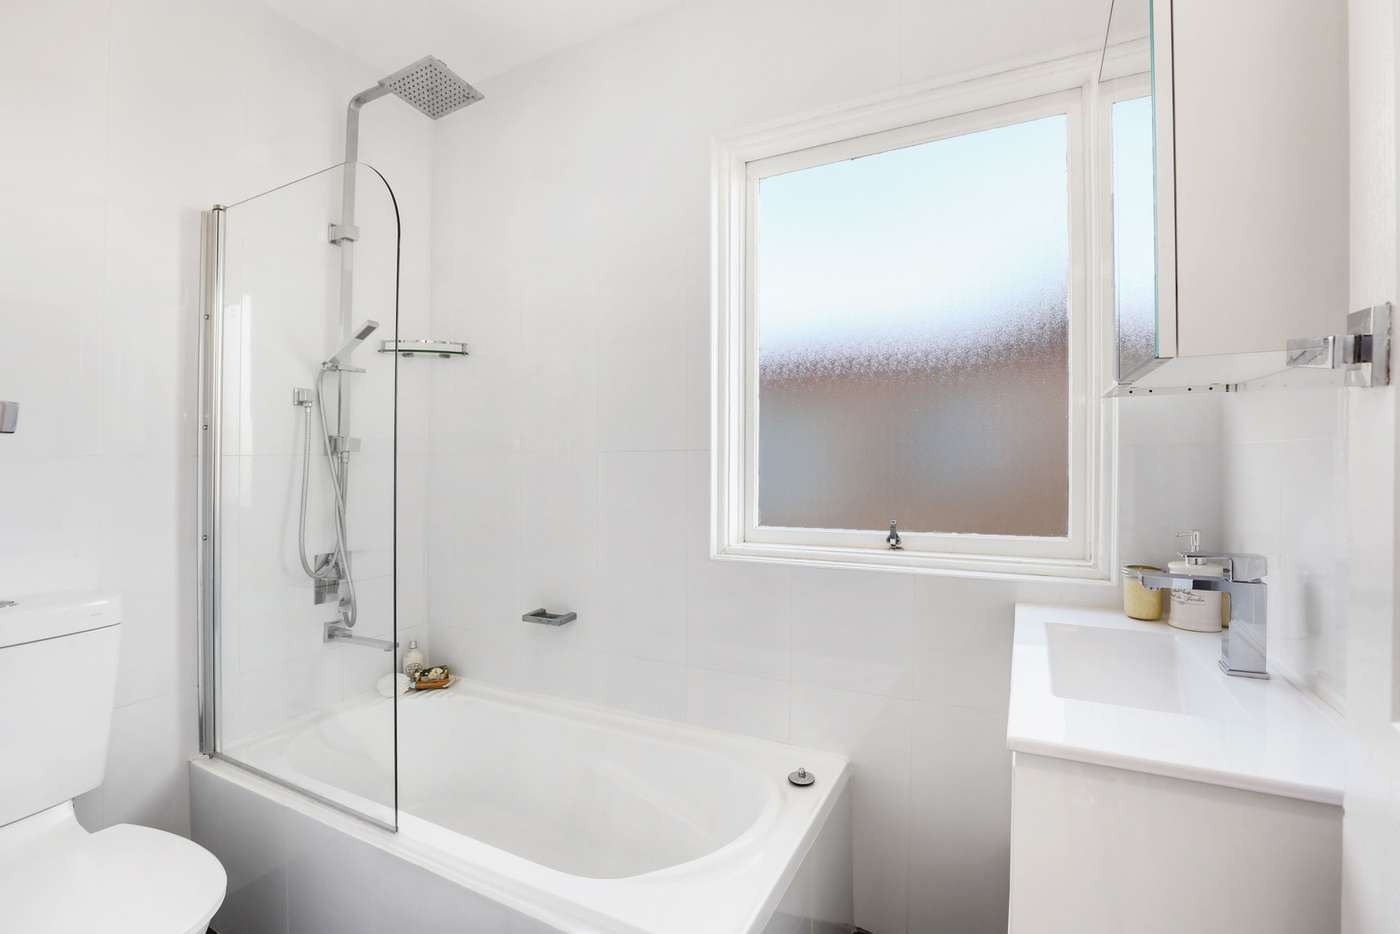 Sixth view of Homely apartment listing, 12/90 Raglan Street, Mosman NSW 2088